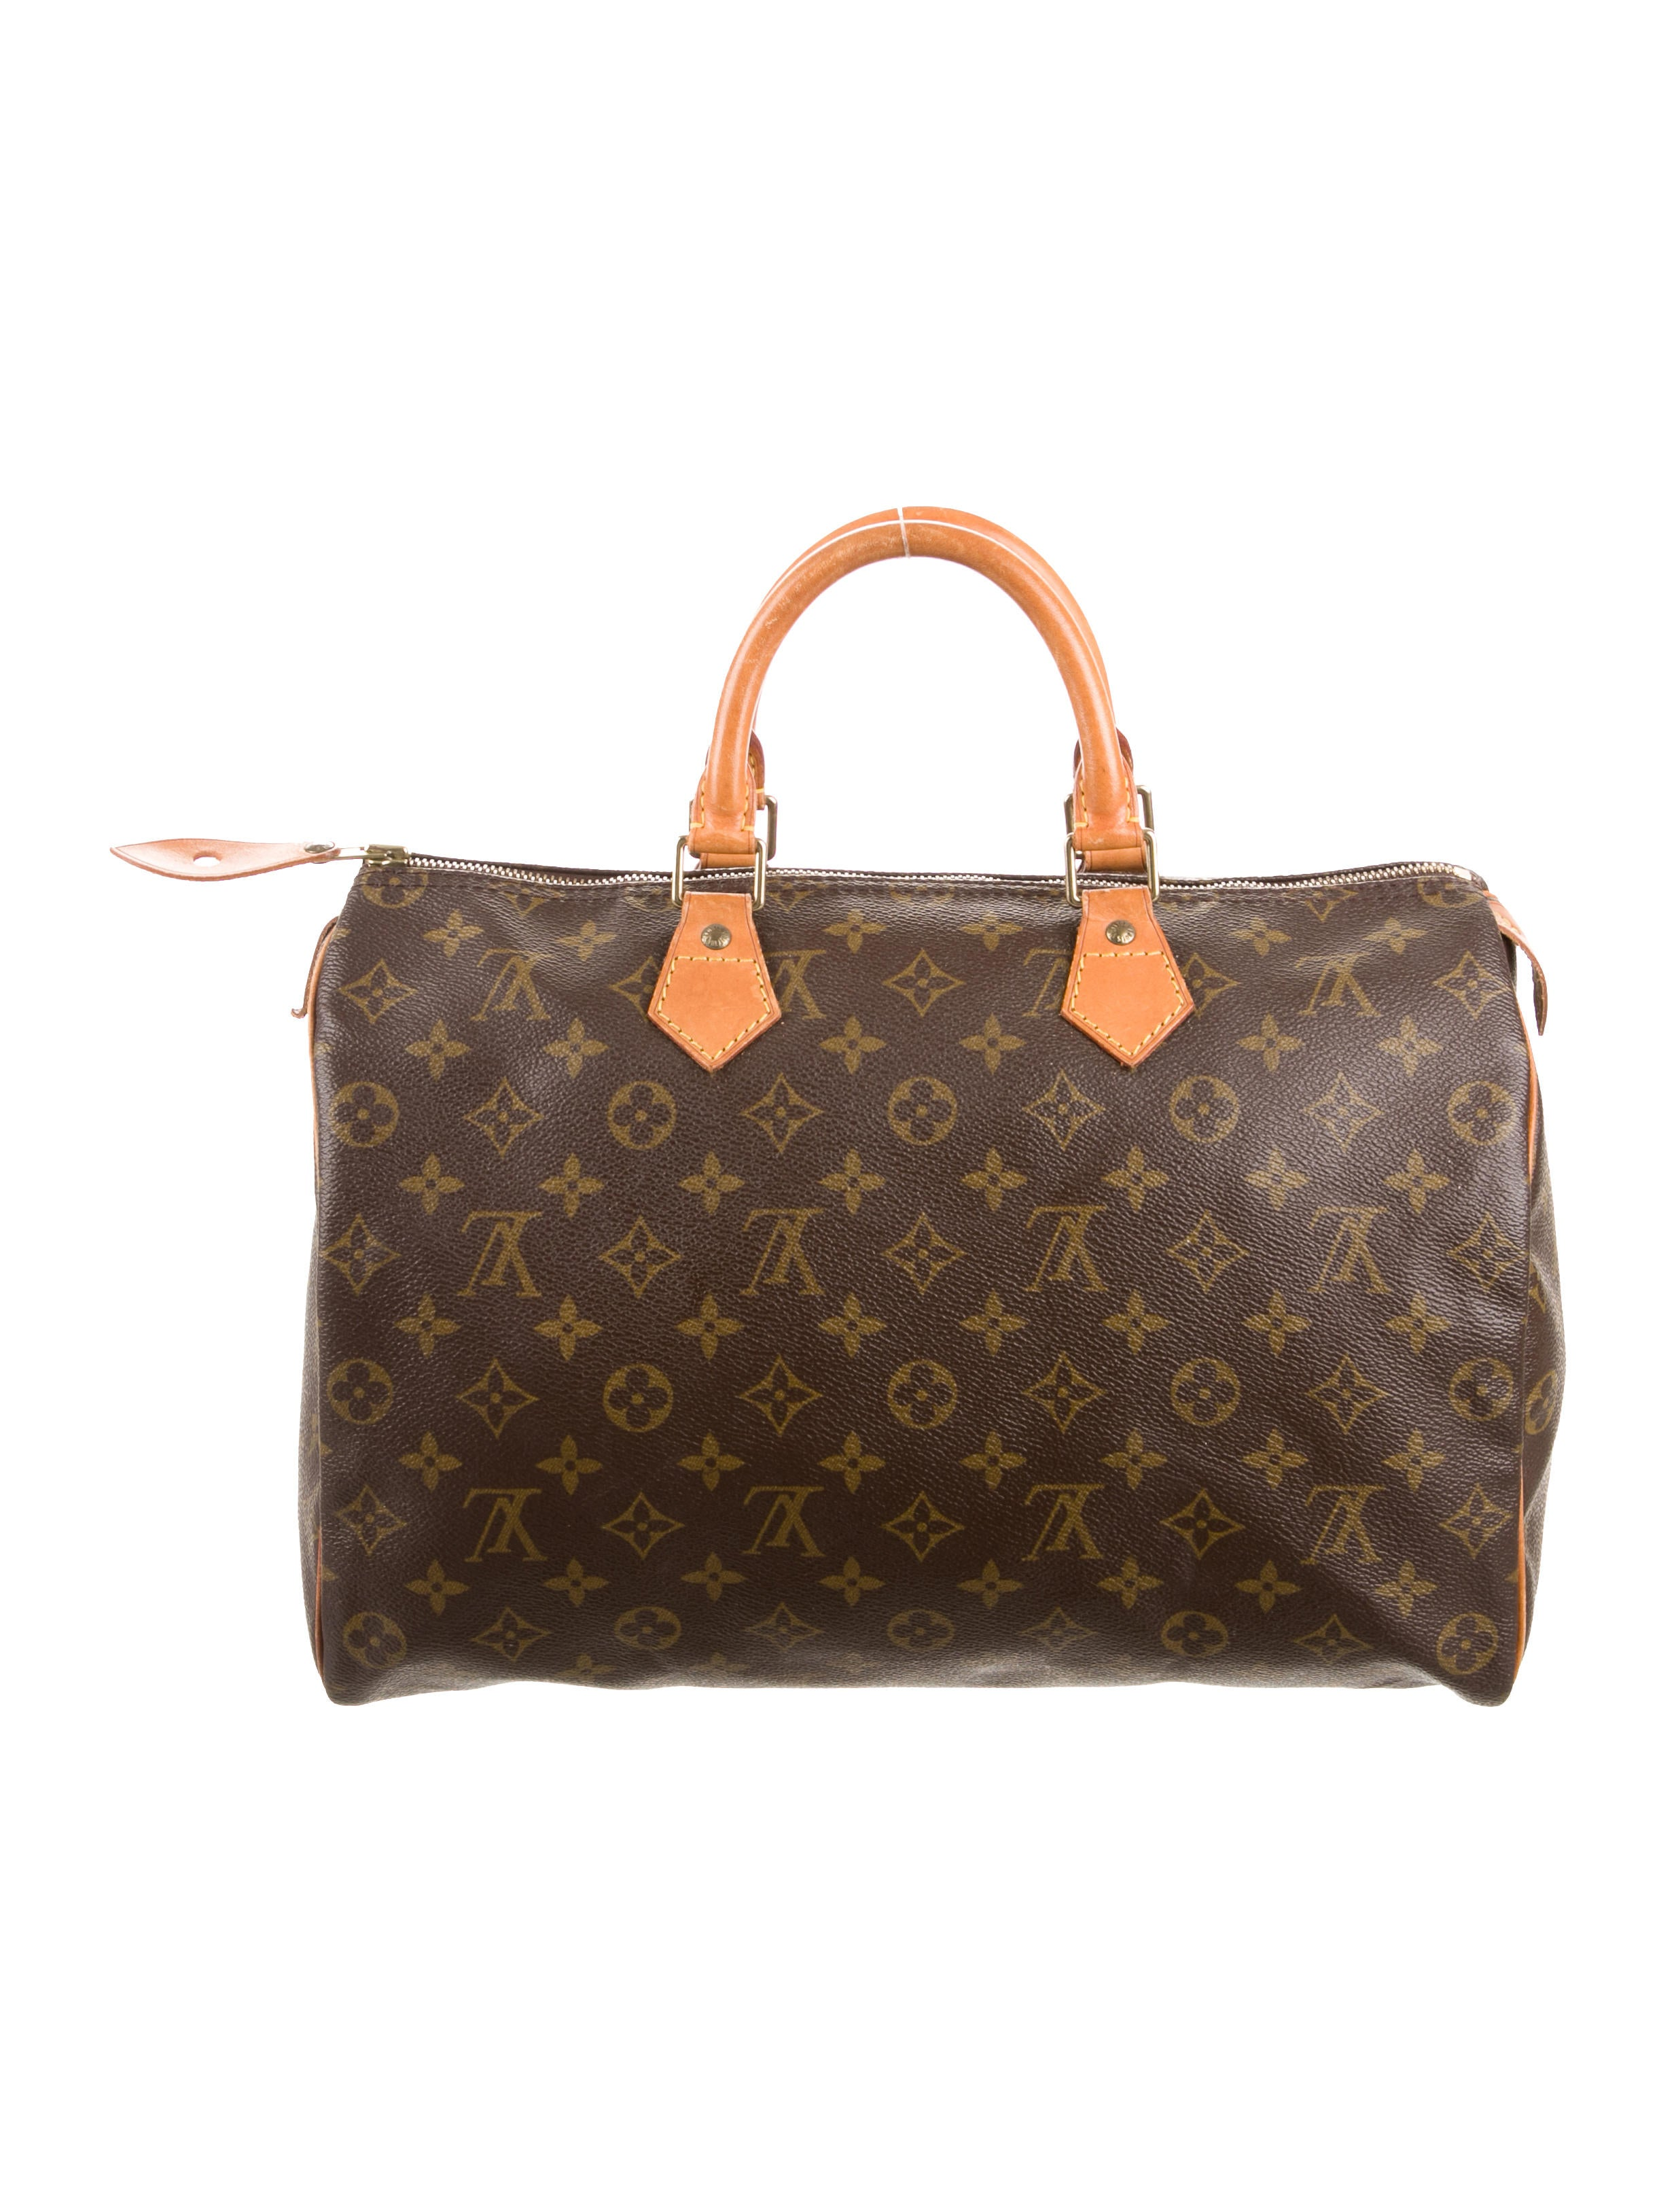 Louis vuitton monogram speedy 35 handbags lou107130 for Louis vuitton miroir speedy 35